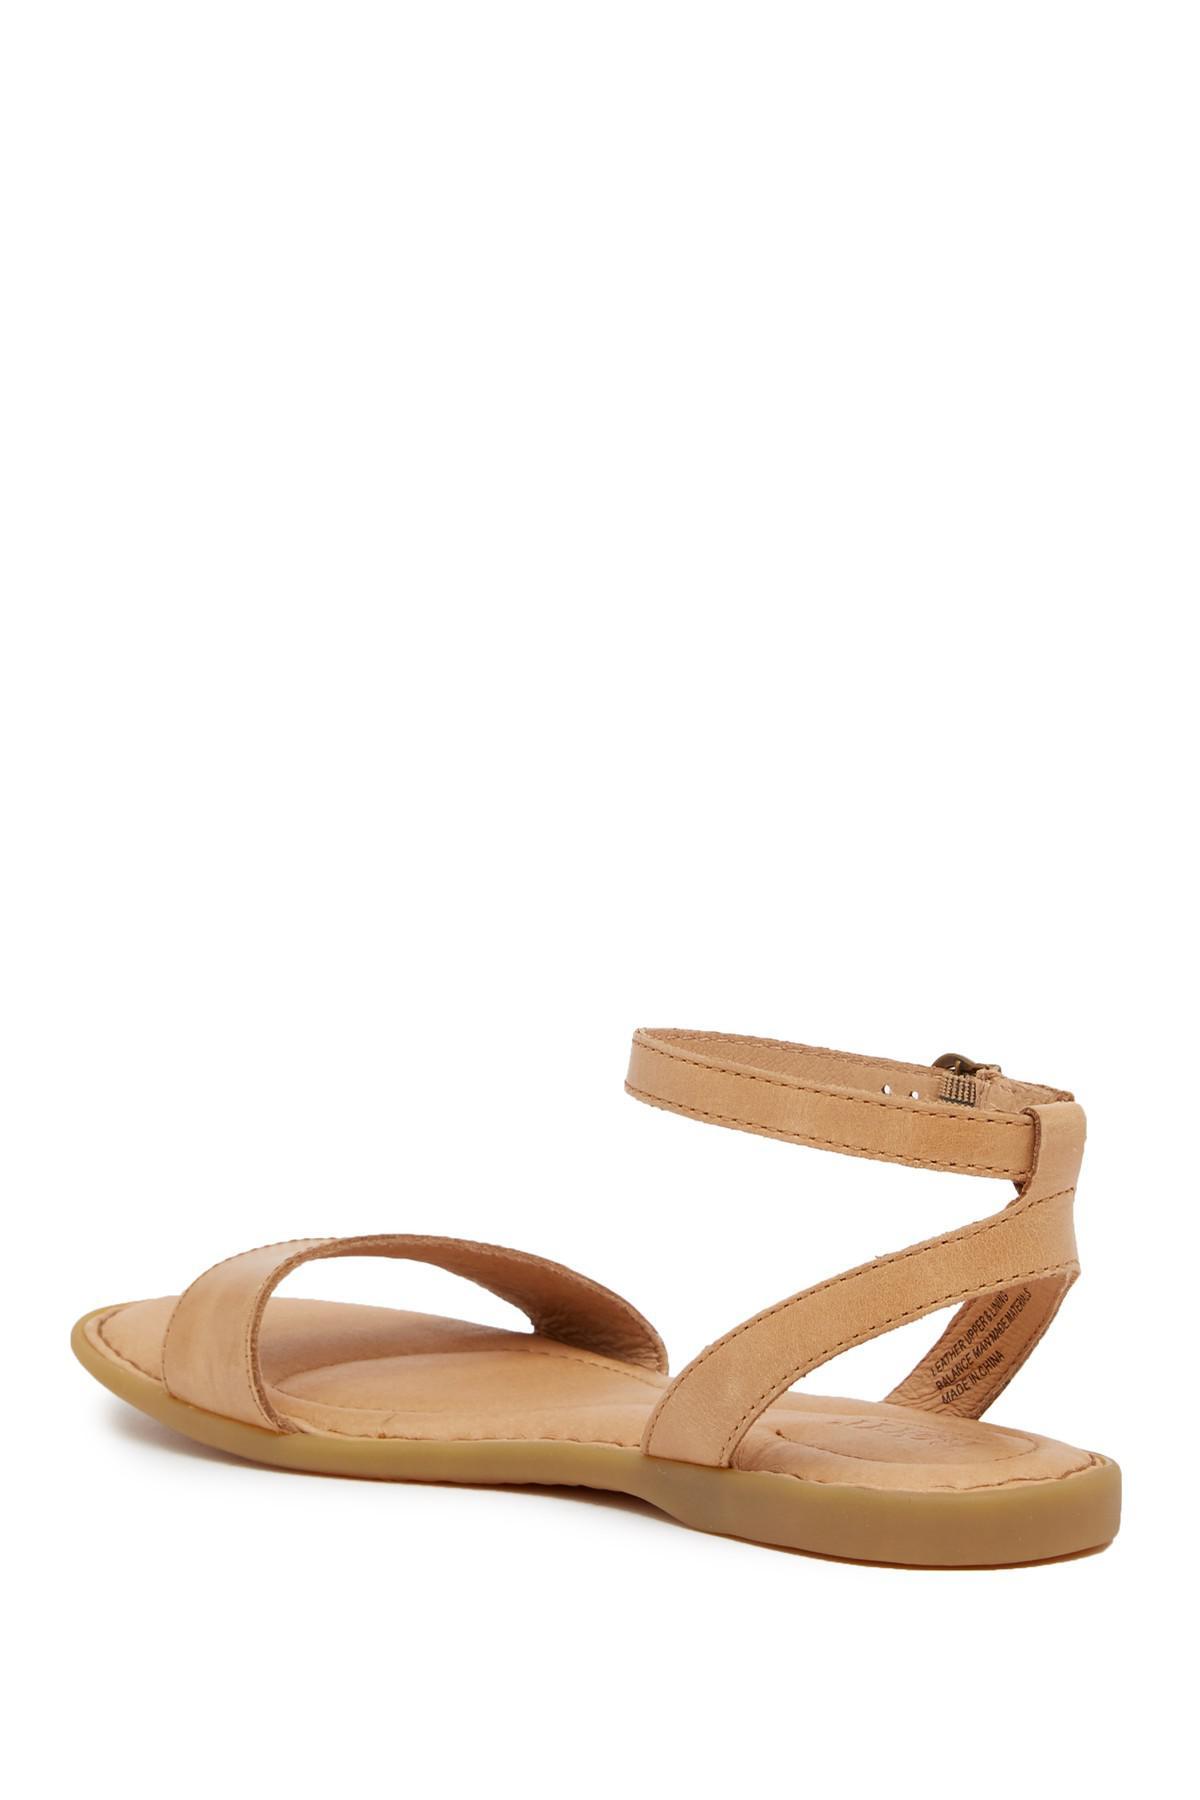 ca85cf0092b6 Born - Brown Alice Ankle Strap Sandal - Lyst. View fullscreen